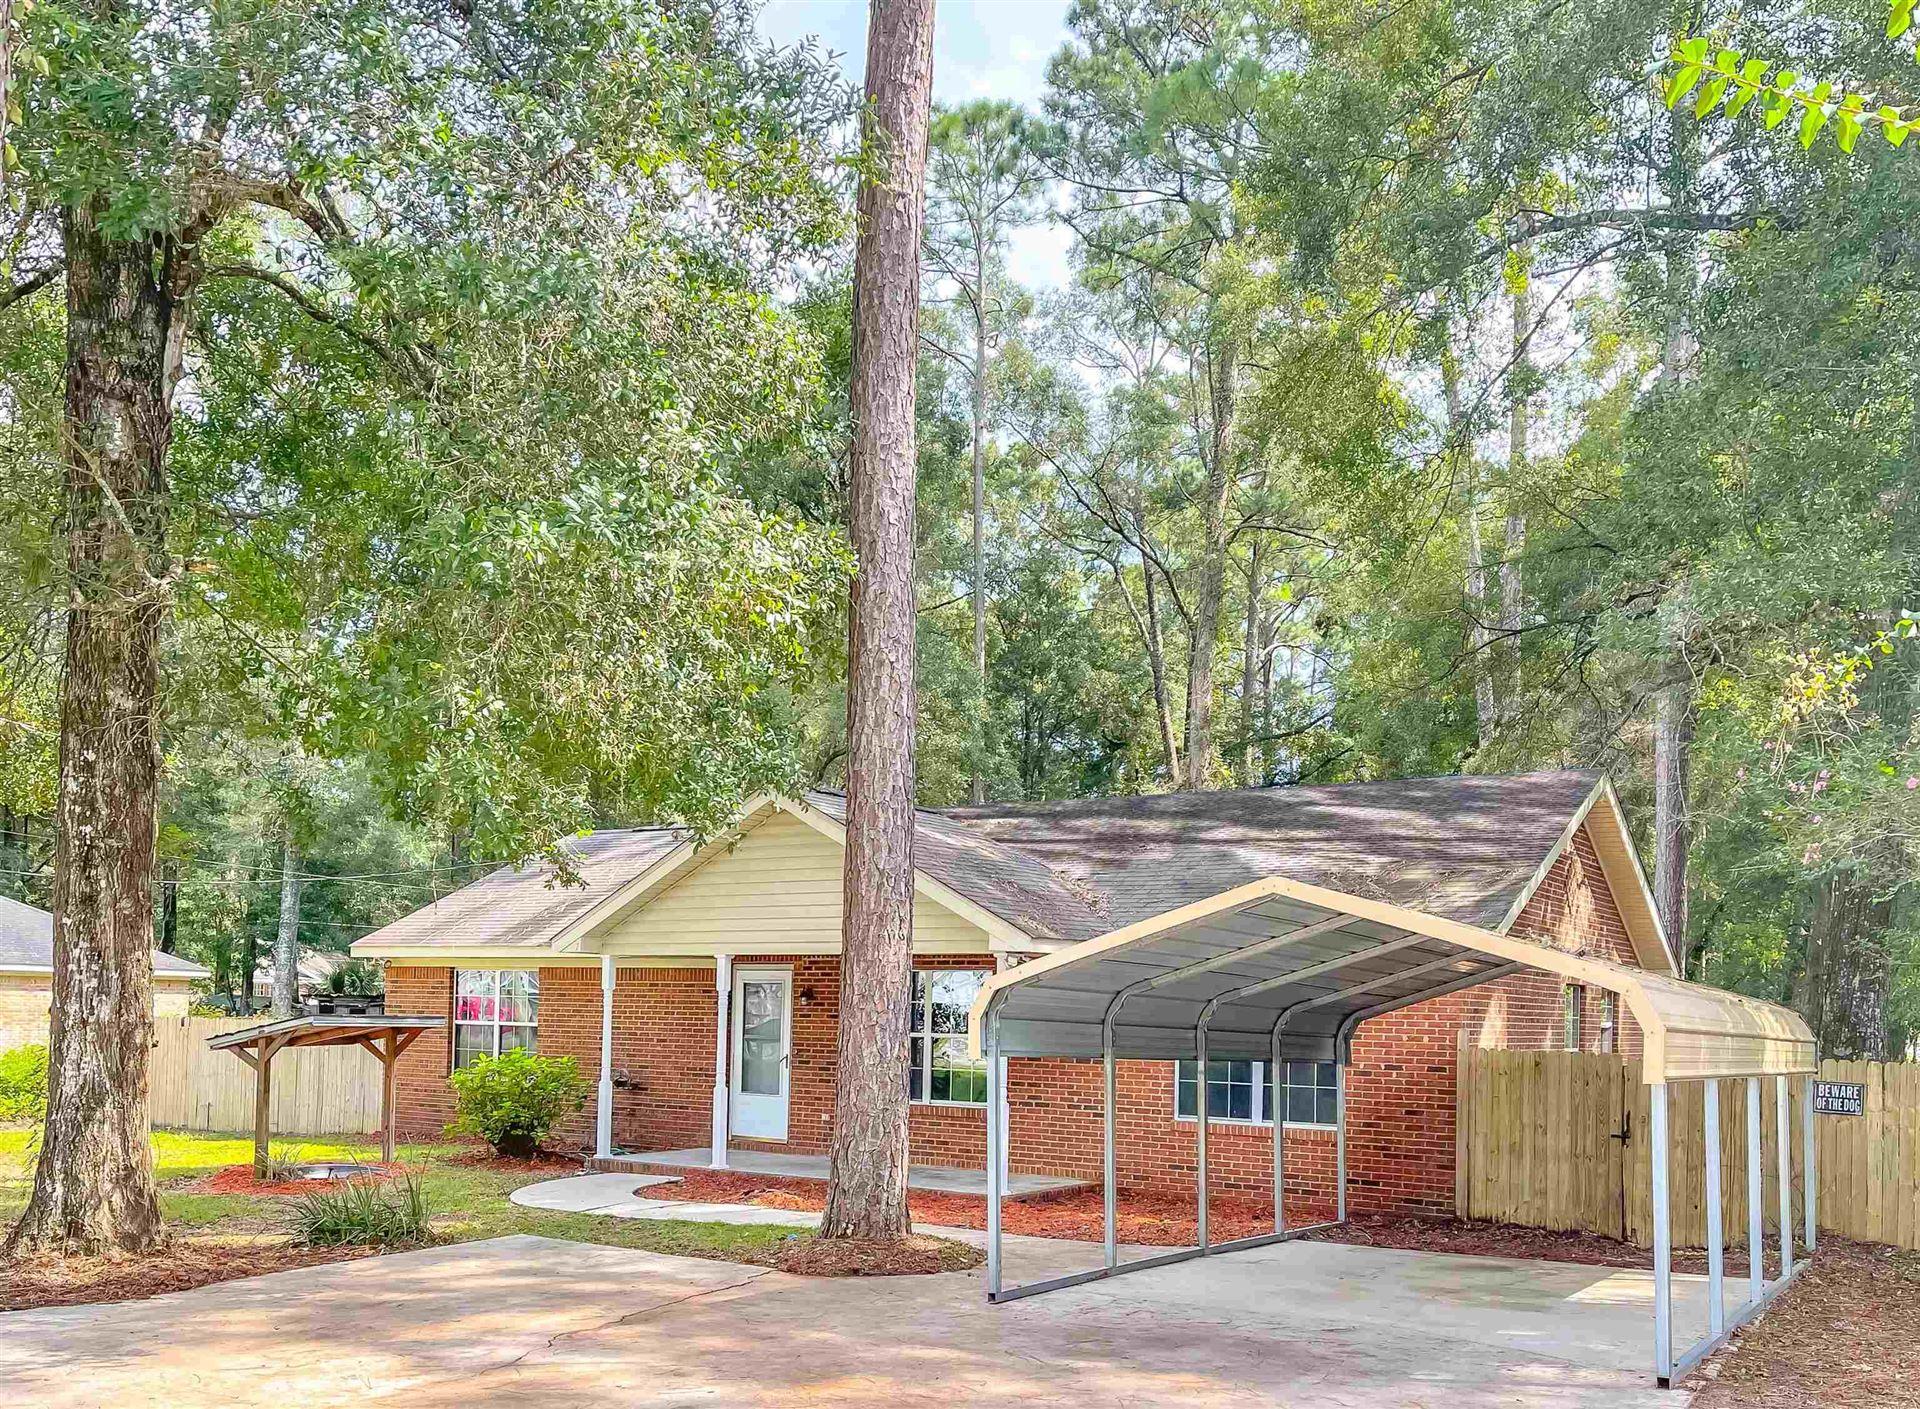 7 Chickat Trail, Crawfordville, FL 32327 - MLS#: 337643